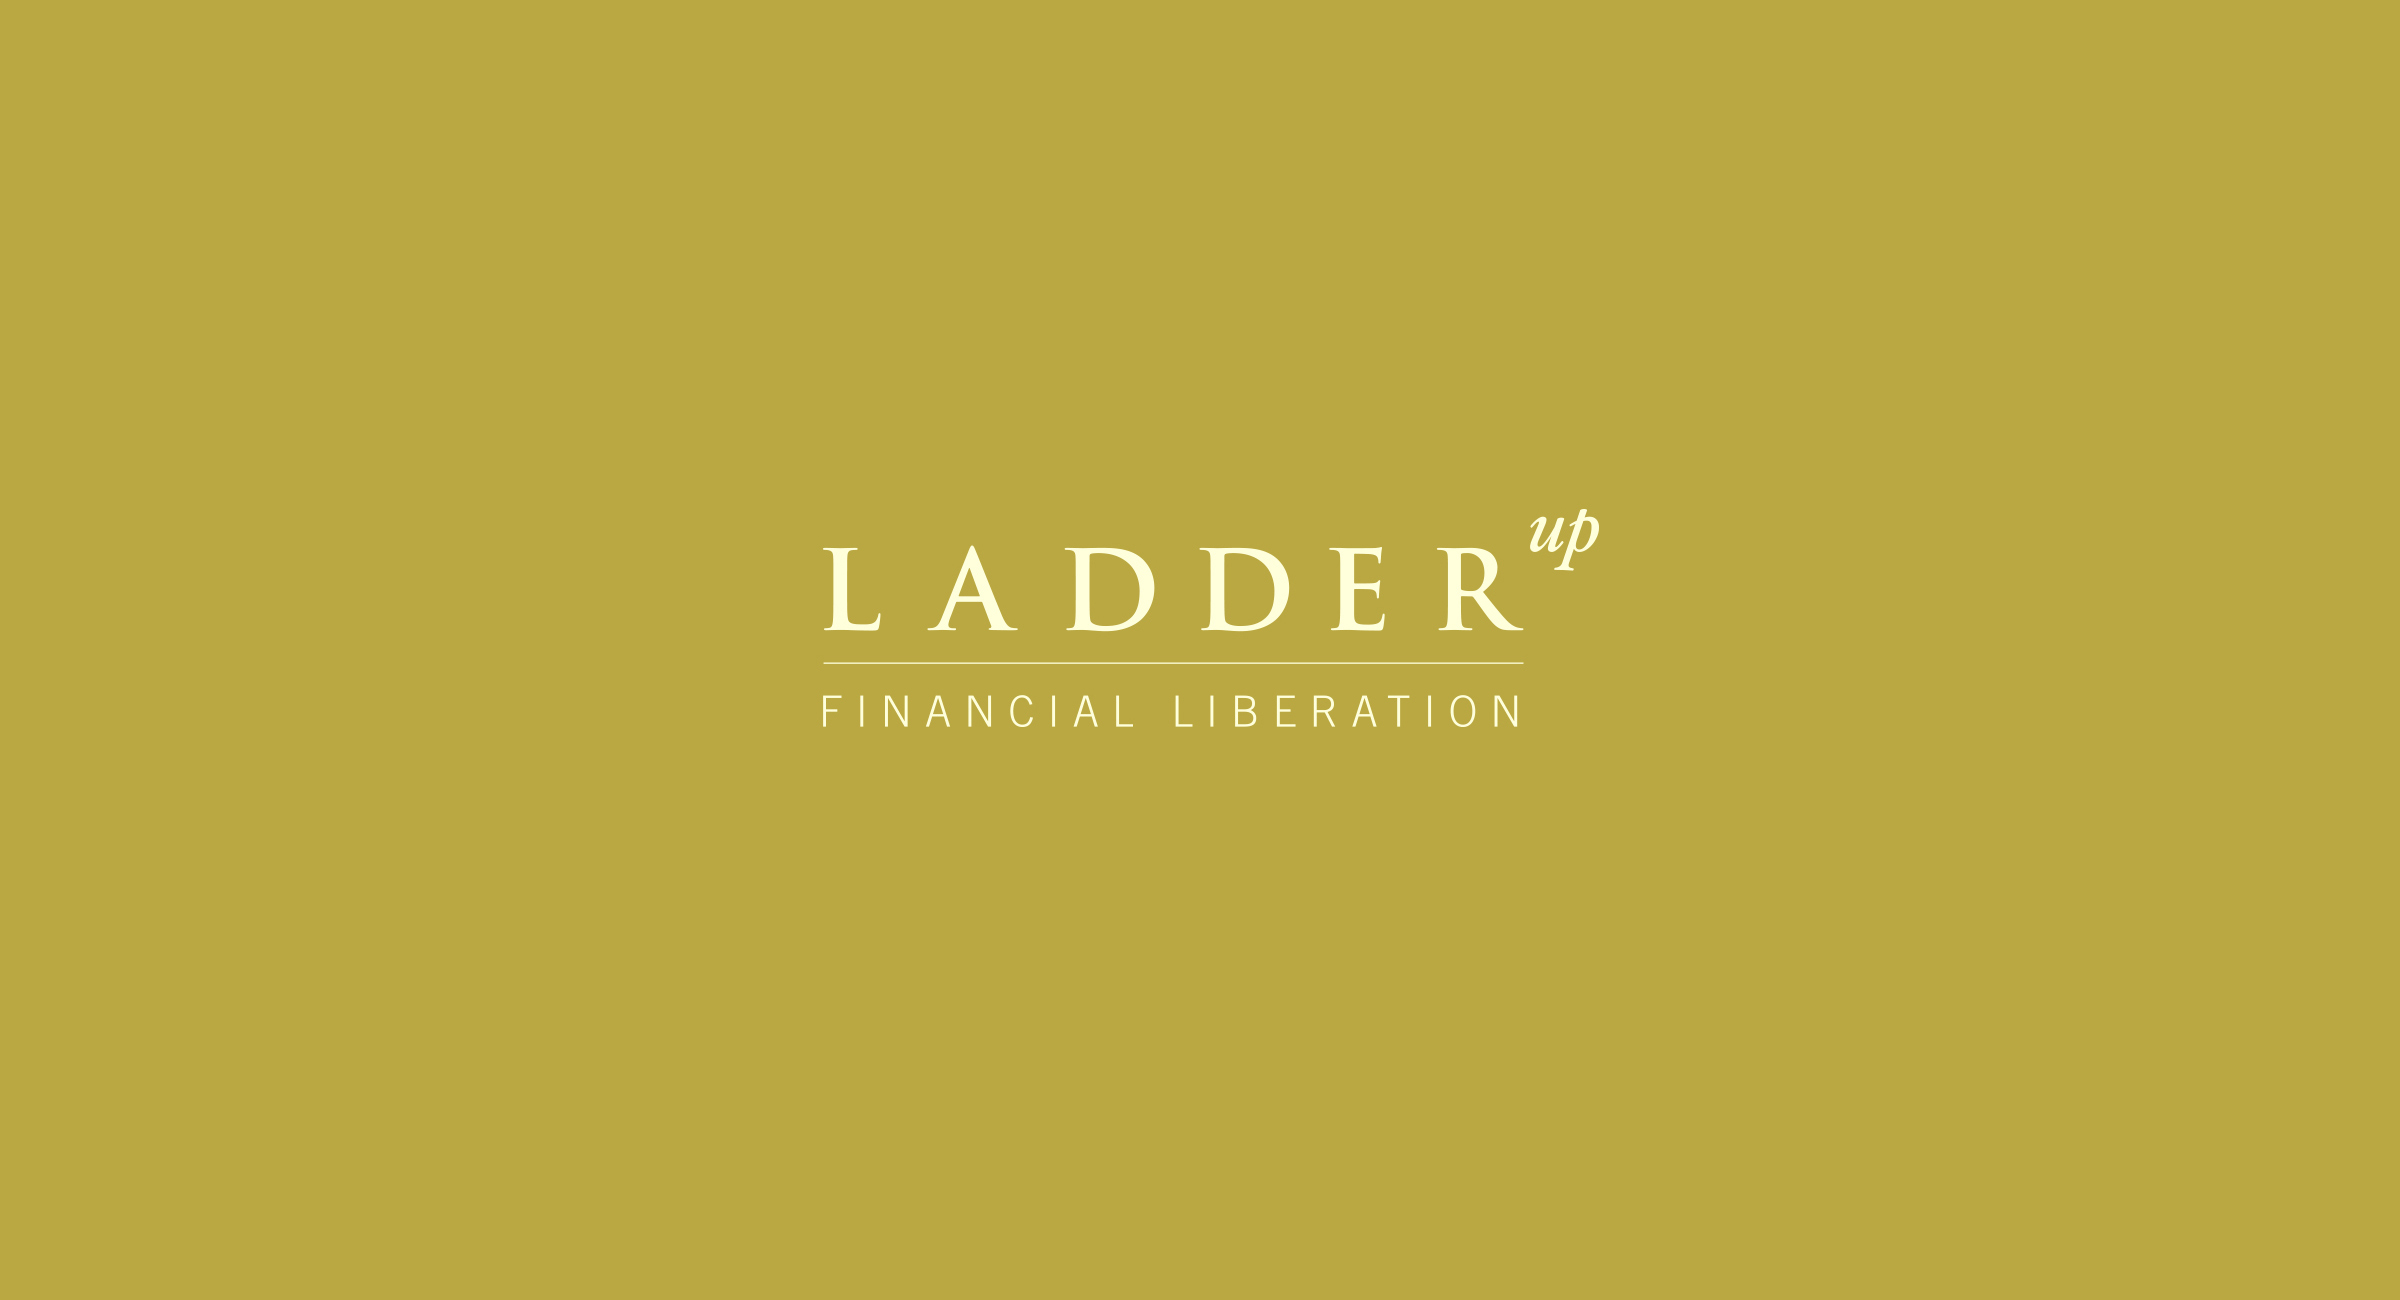 Logo_Branding_LadderUp_McQuade_Design_1.jpg